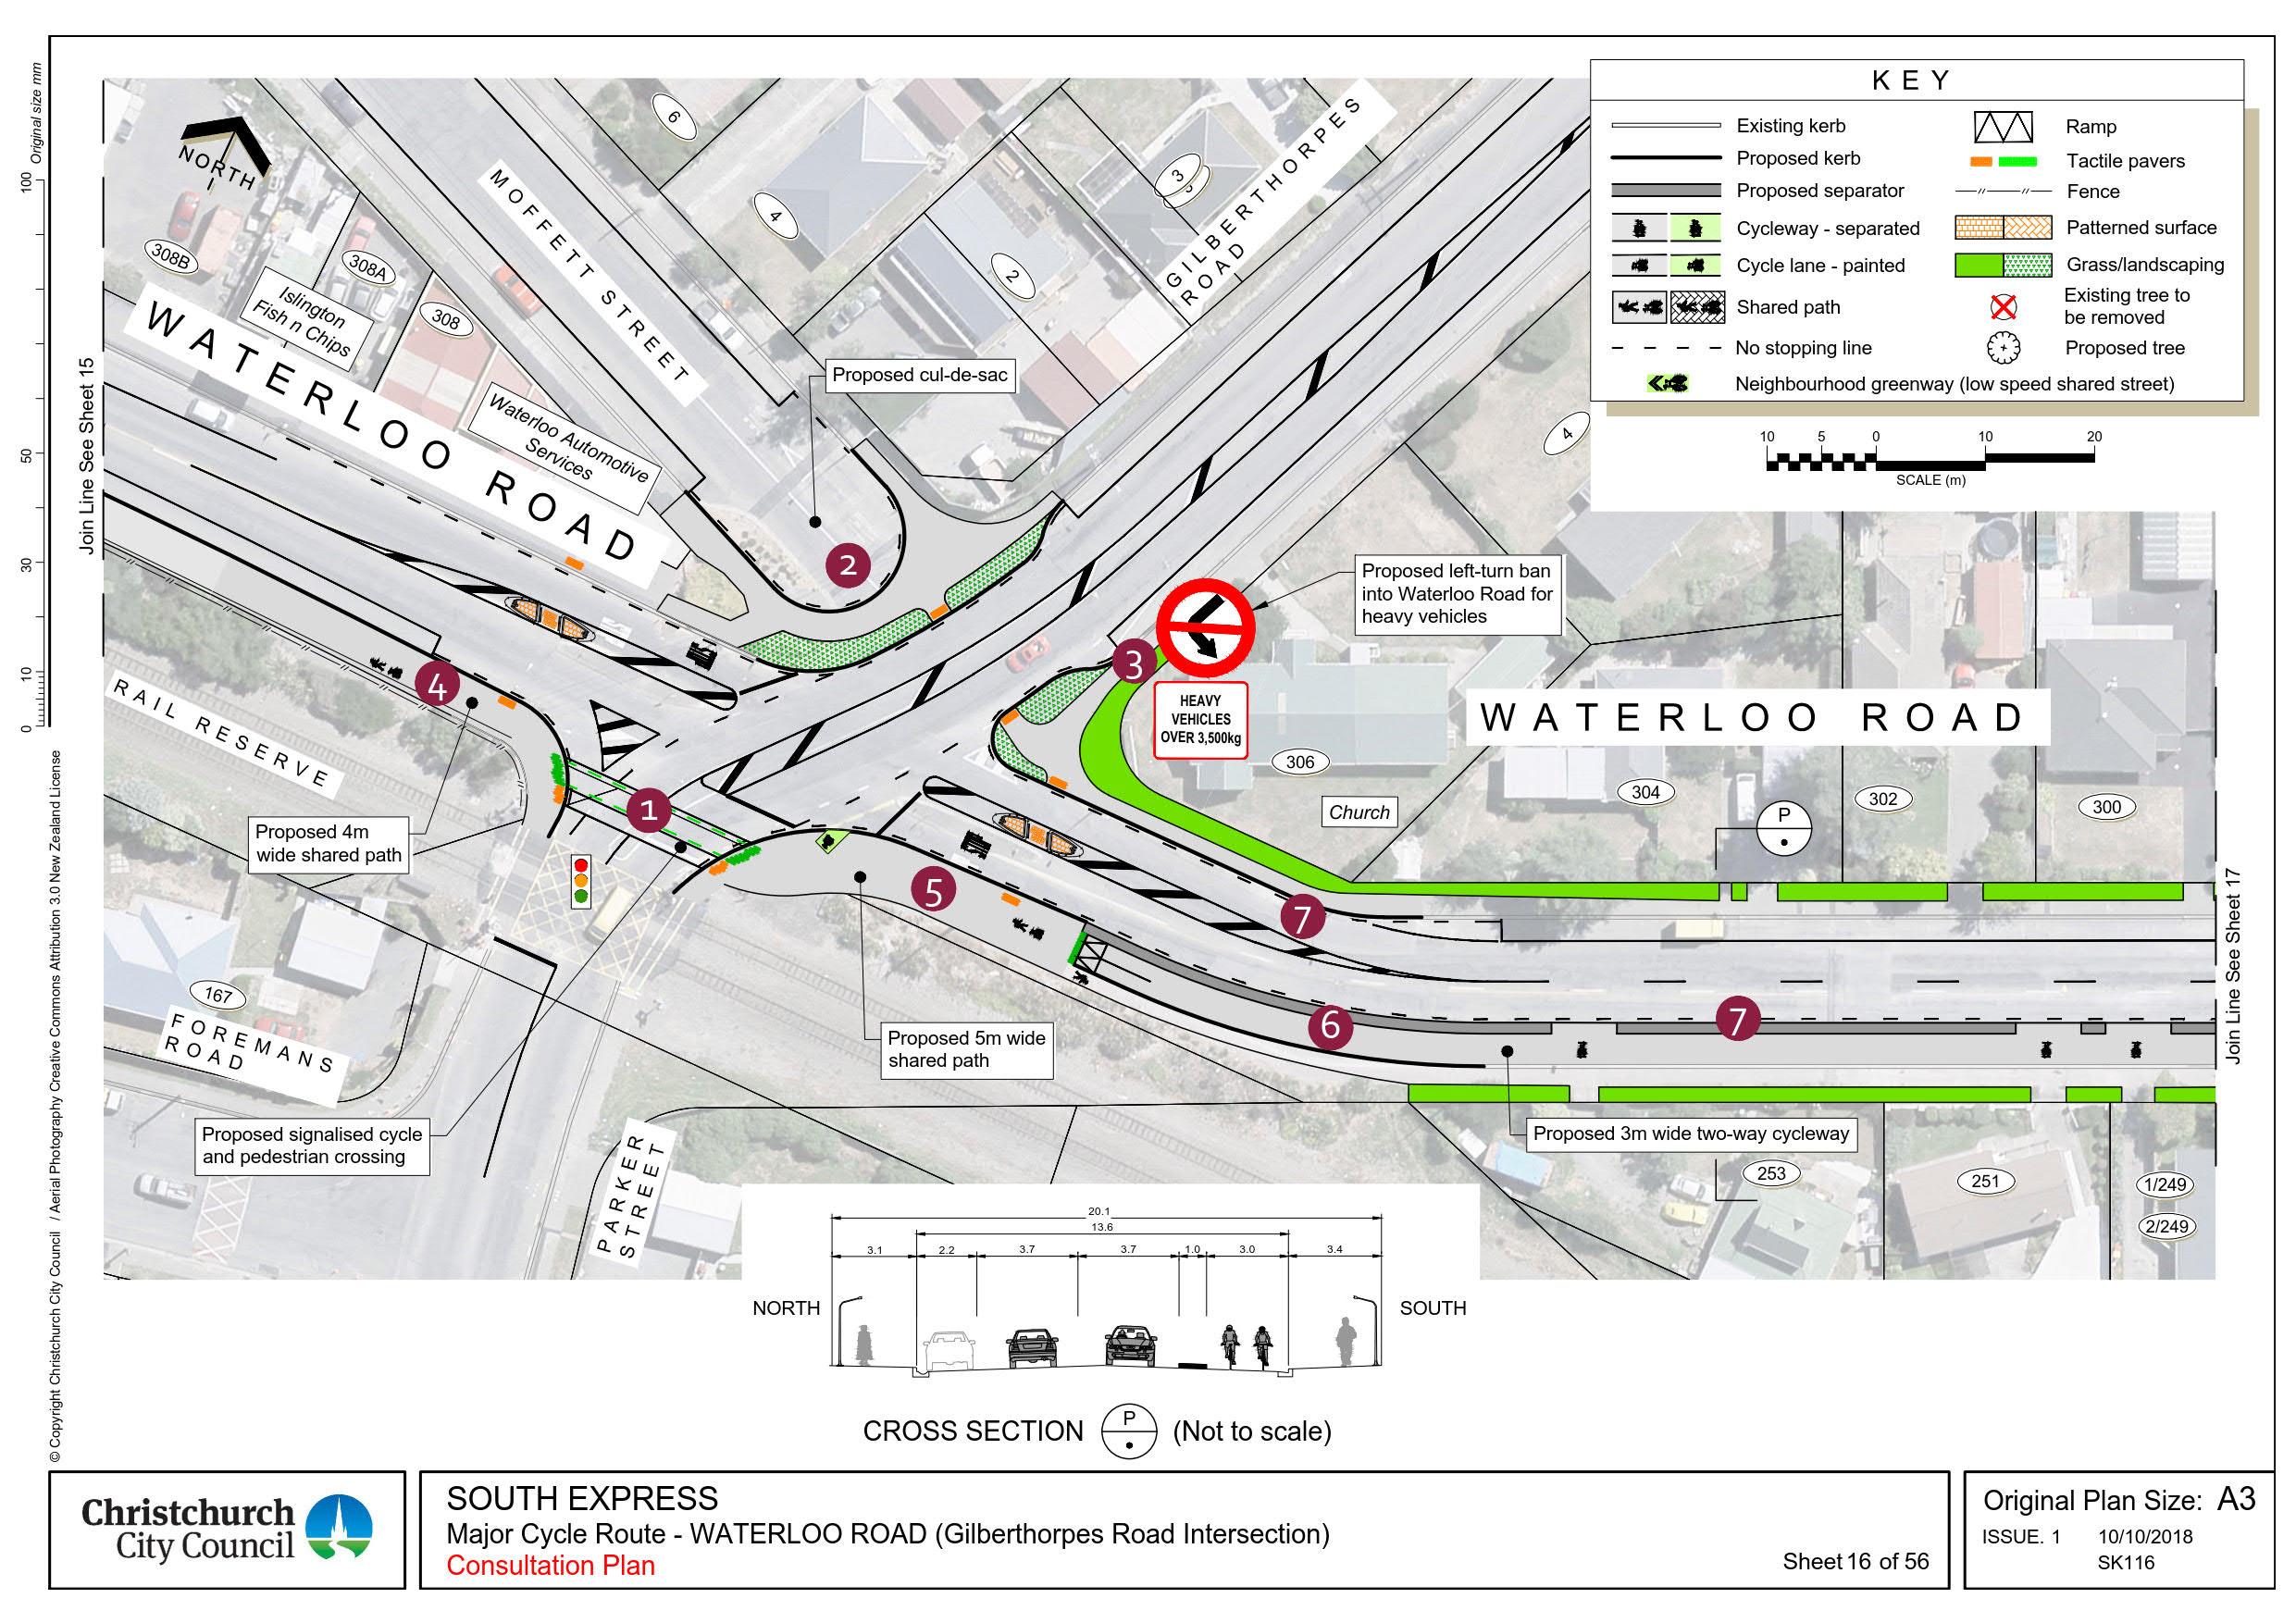 'Waterloo Road (Gilberthorpes Road intersection)